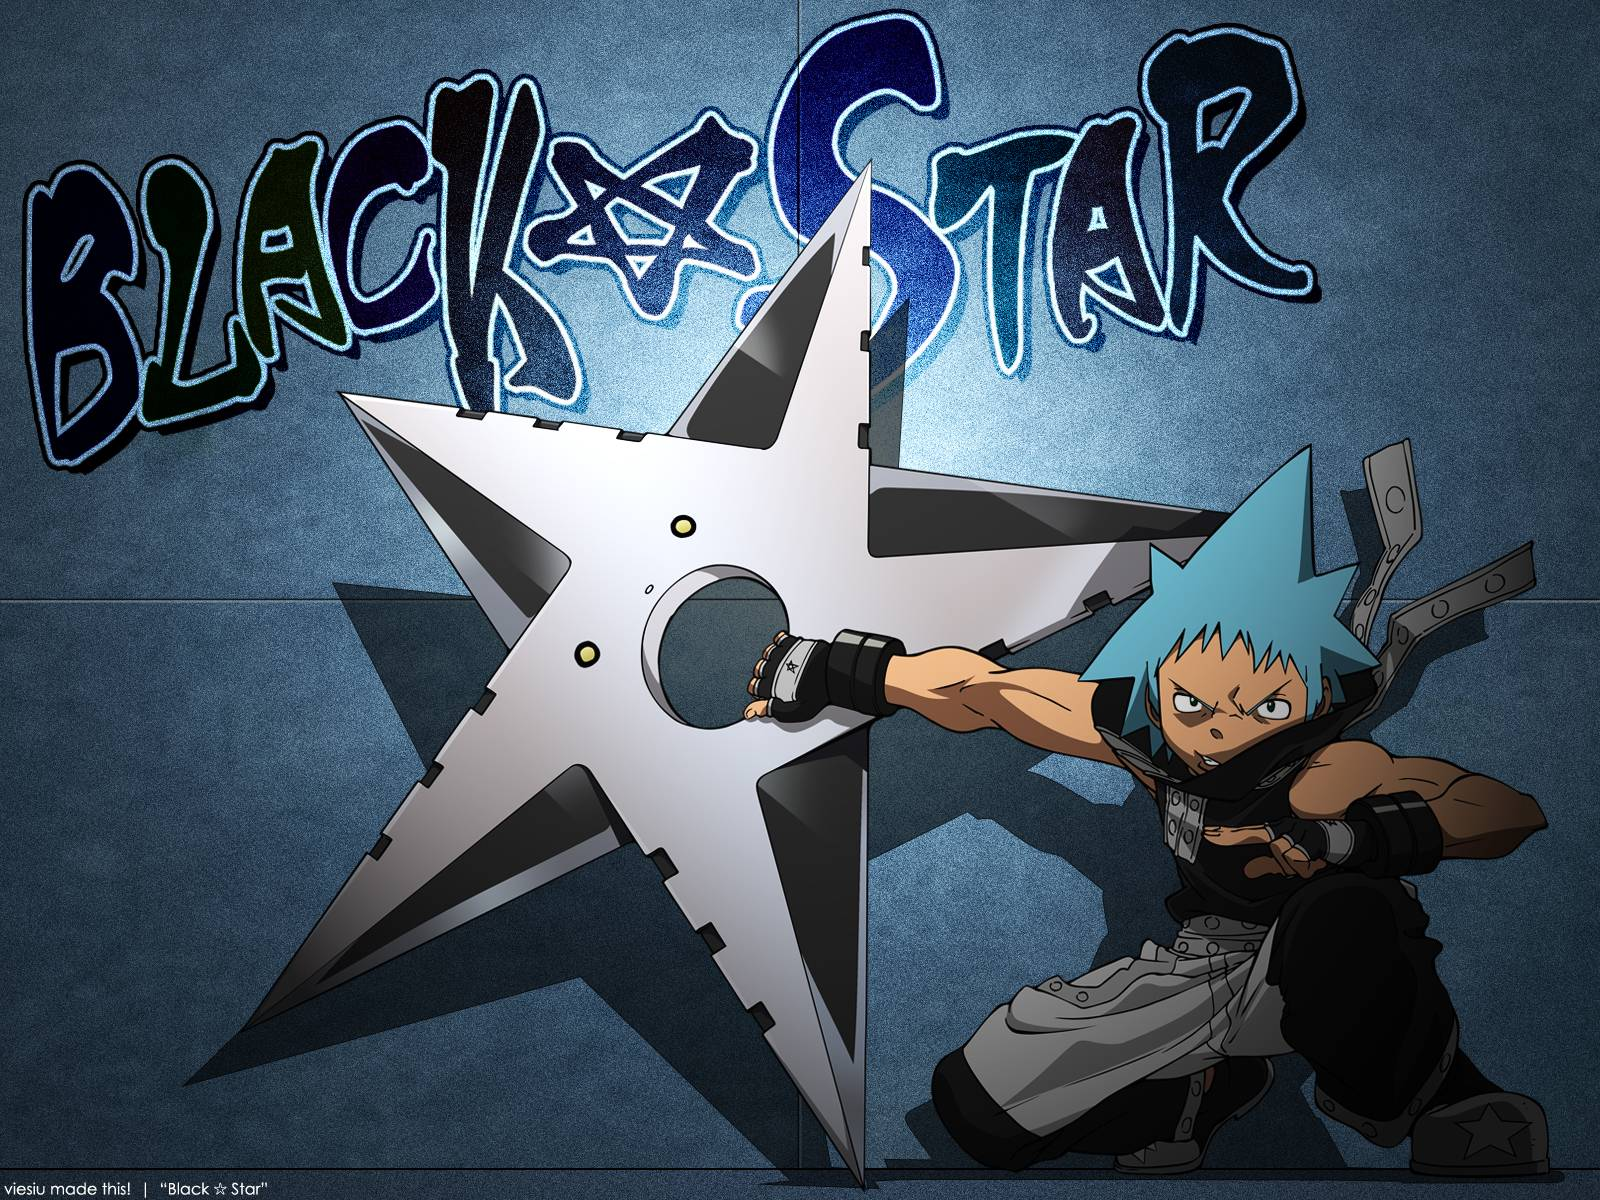 Soul eater black star wallpapers wallpaper cave blackstar soul eater wallpaper 26126836 fanpop voltagebd Images